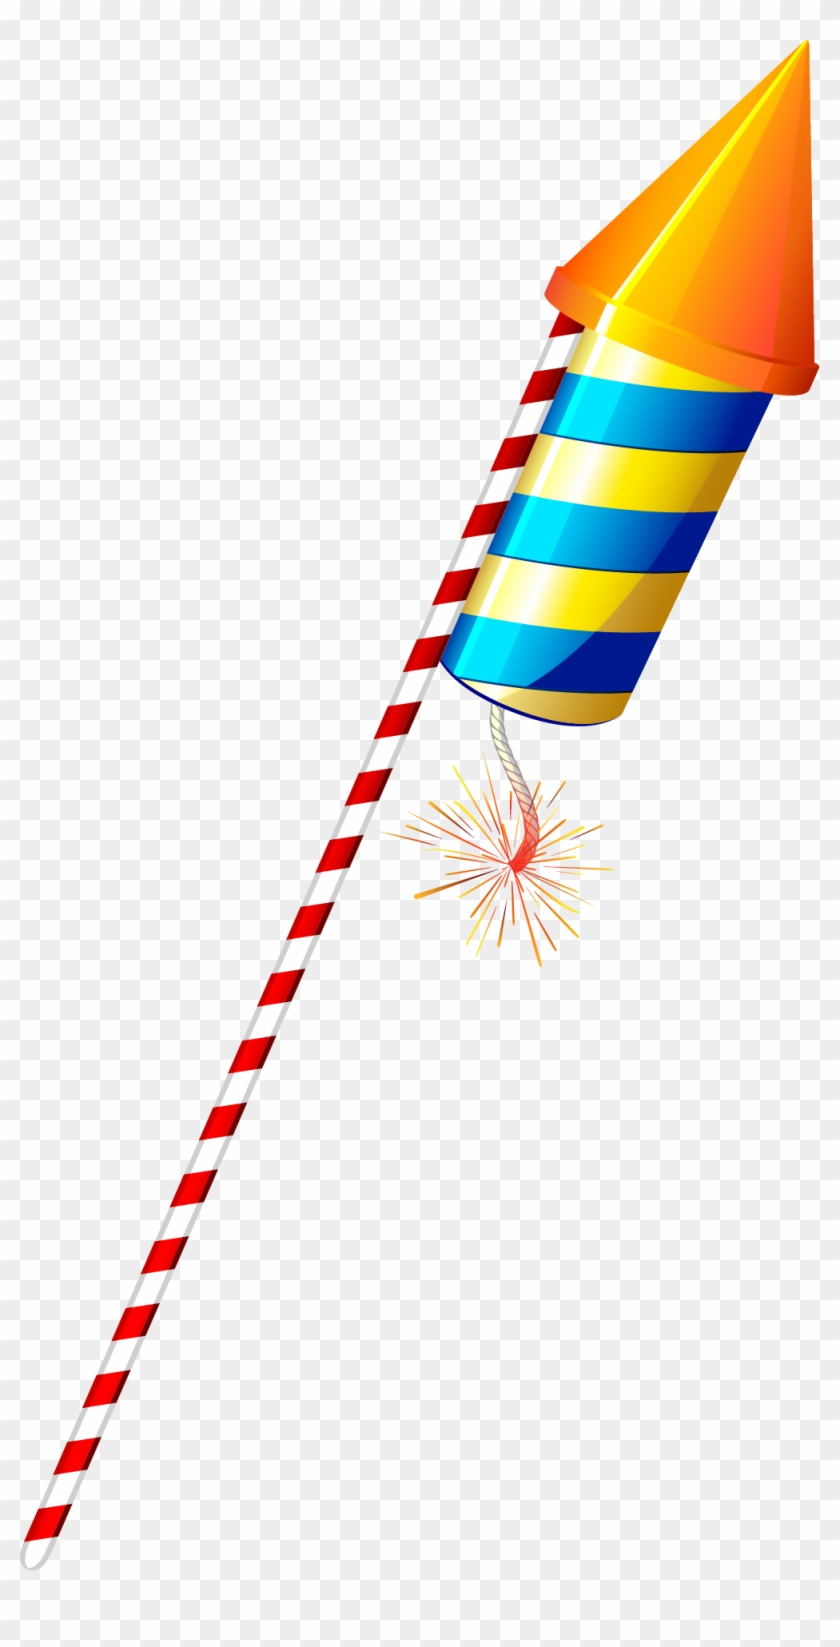 Fireworks Clip Firecracker - Diwali Crackers Rocket Png #1382913